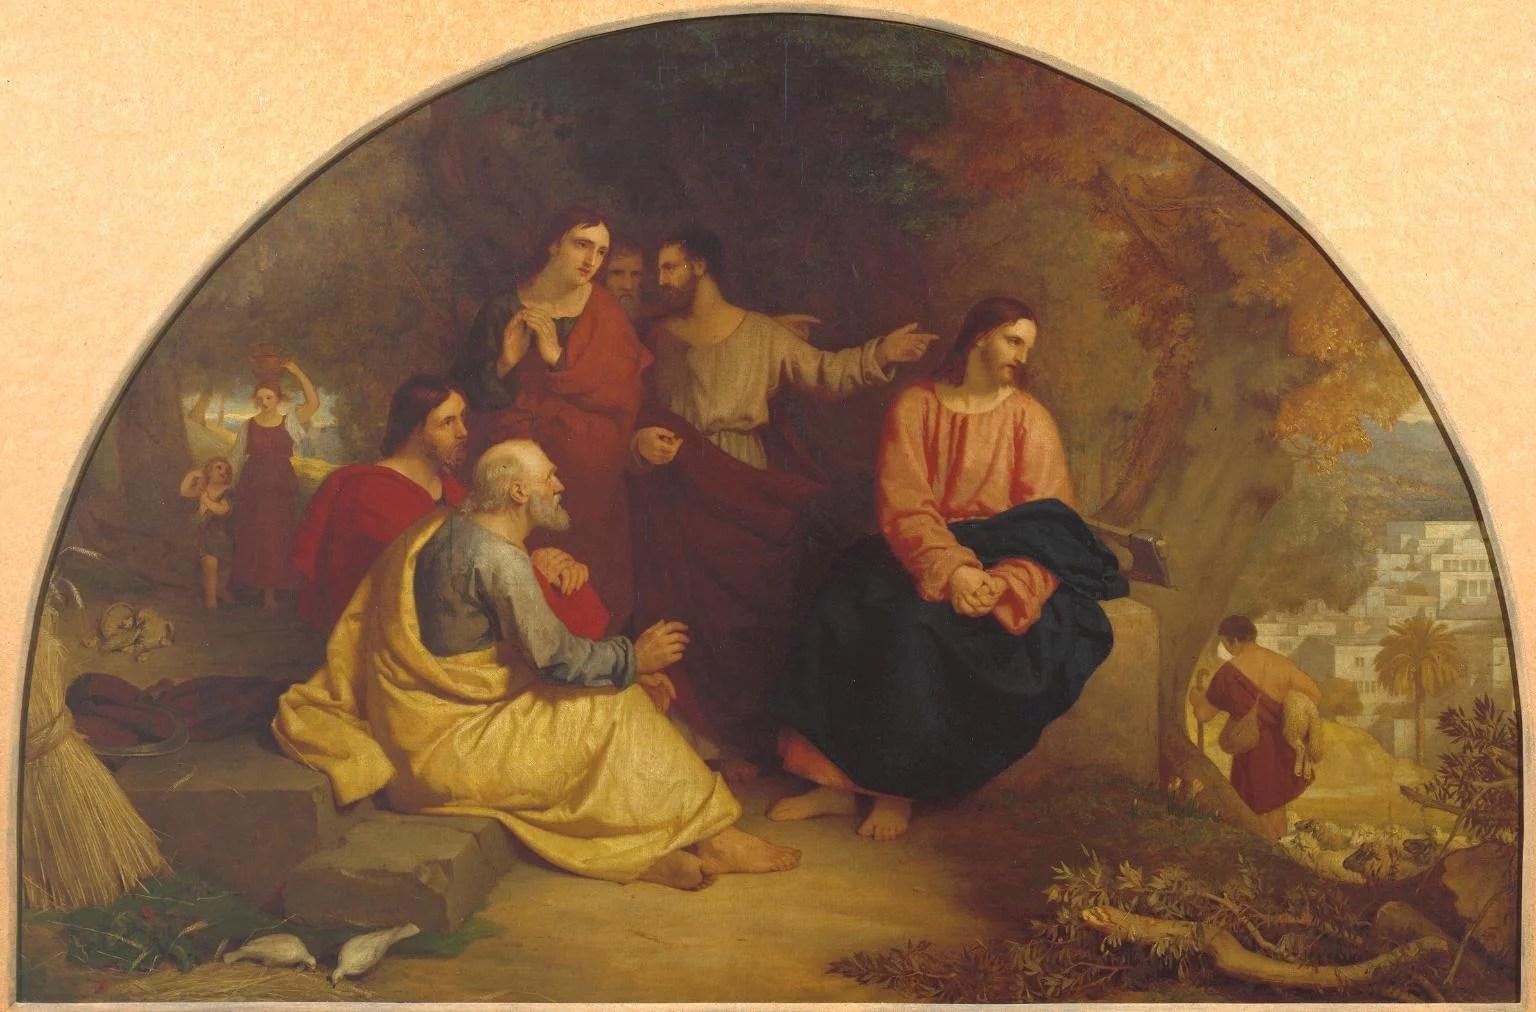 Daily Bible Reading Devotional [Luke 19:41-44] December 13, 2017